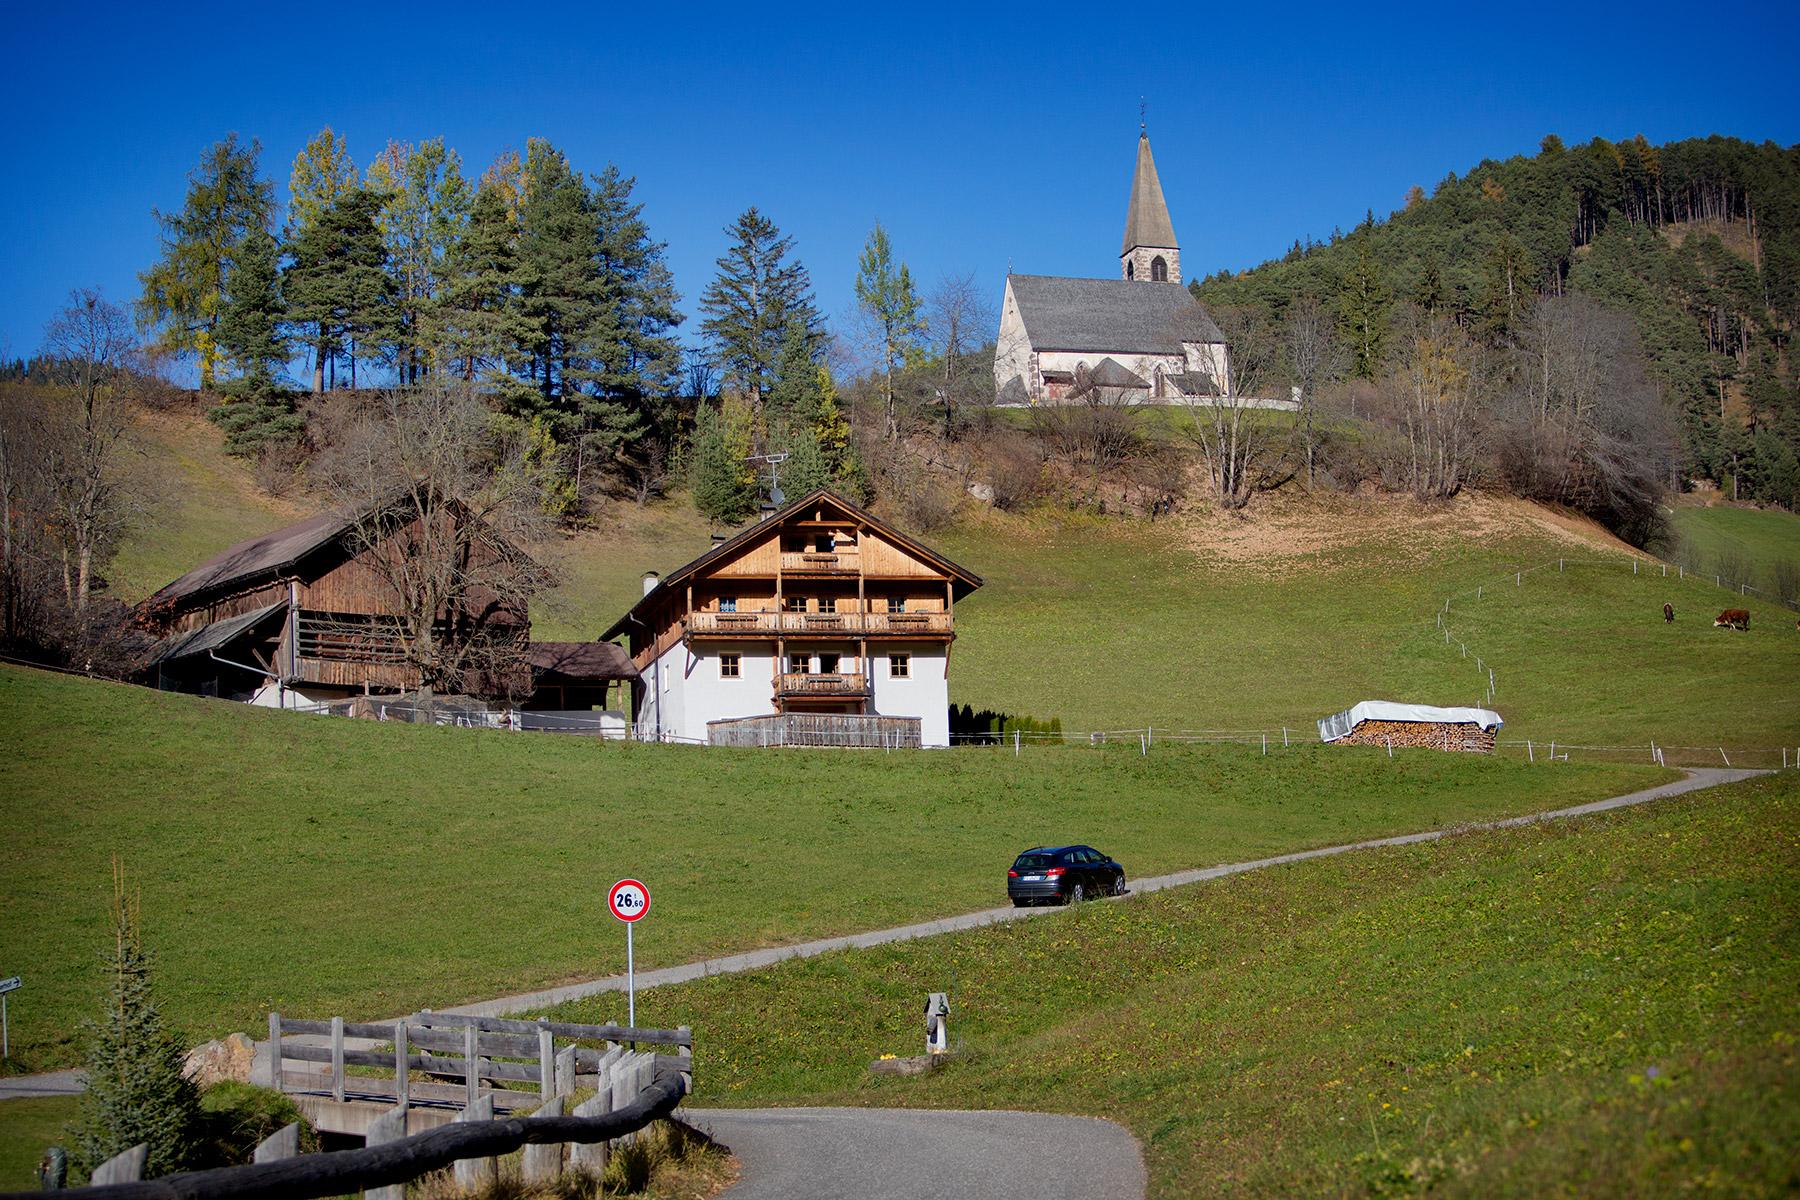 blogg-171026fallerhof4.jpg